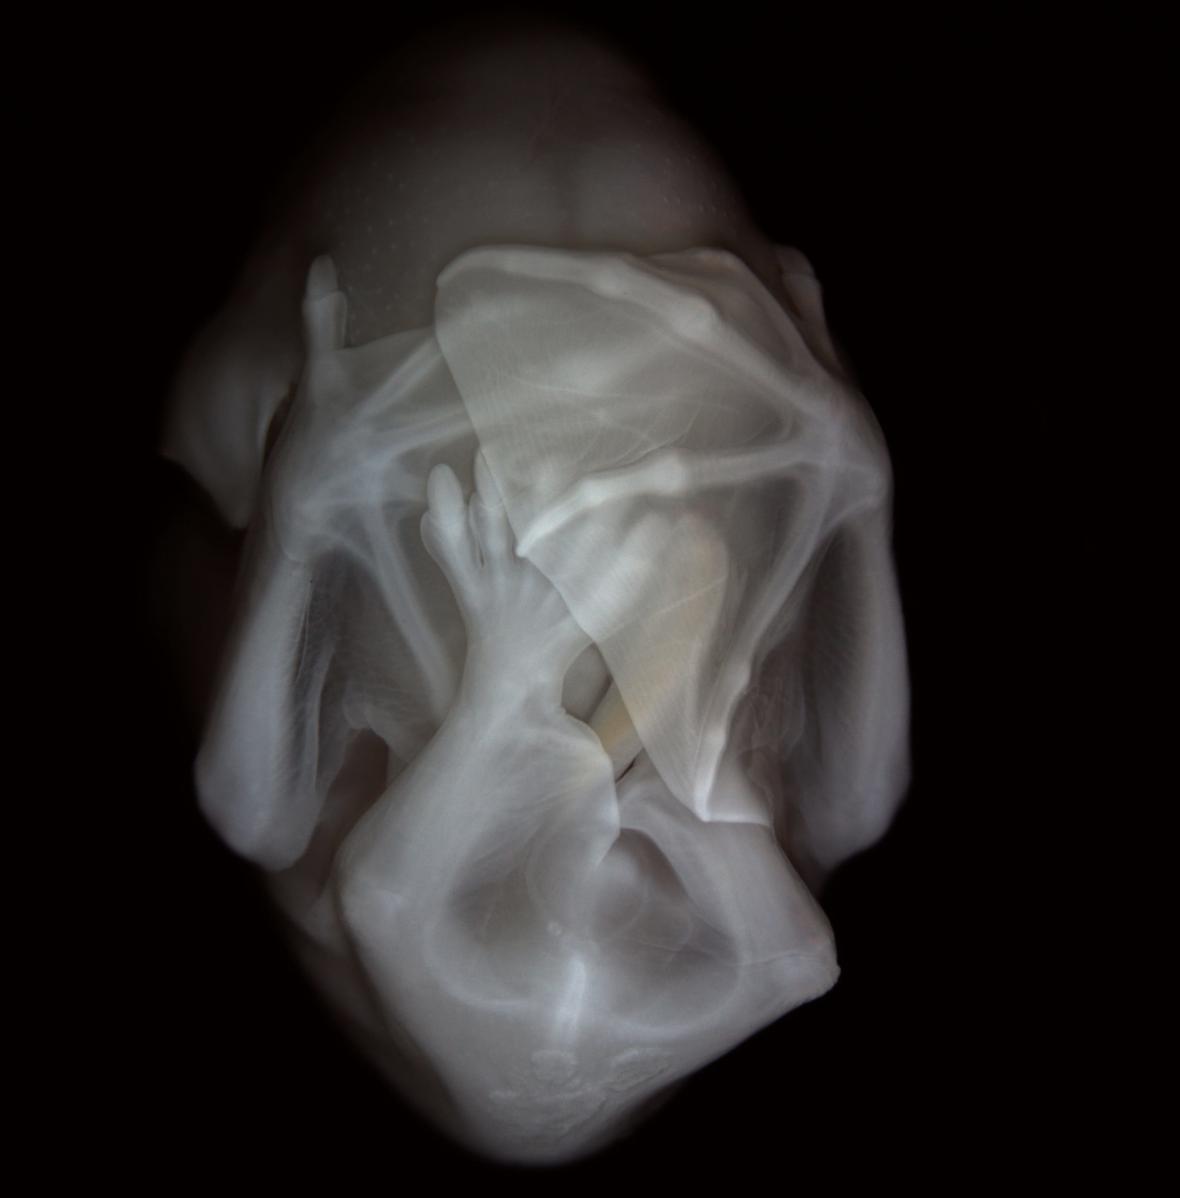 Embryo listonosa krátkoocasého